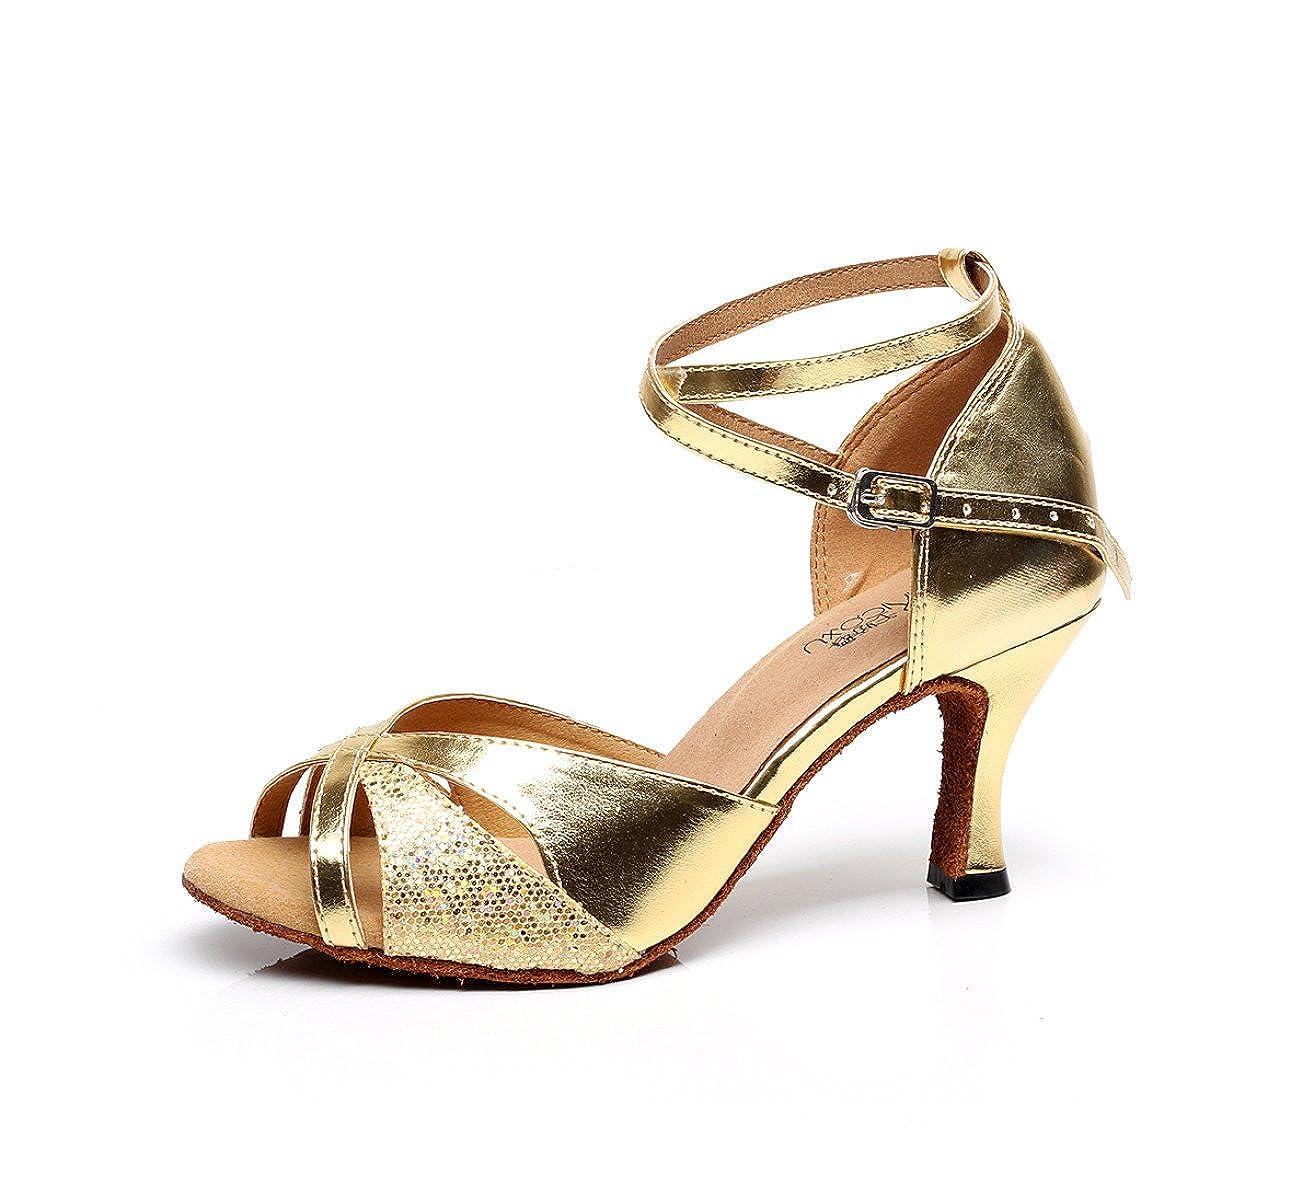 JSHOE Chaussures Femmes Criss Cross Strap Boucle Chaussures Métal Criss Danse Chaussures Salsa/Tango//Samba/Moderne/Jazz Chaussures Sandales Talons Hauts,Gold-heeled7.5cm-UK7.5/EU42/Our43 - 1da7419 - piero.space